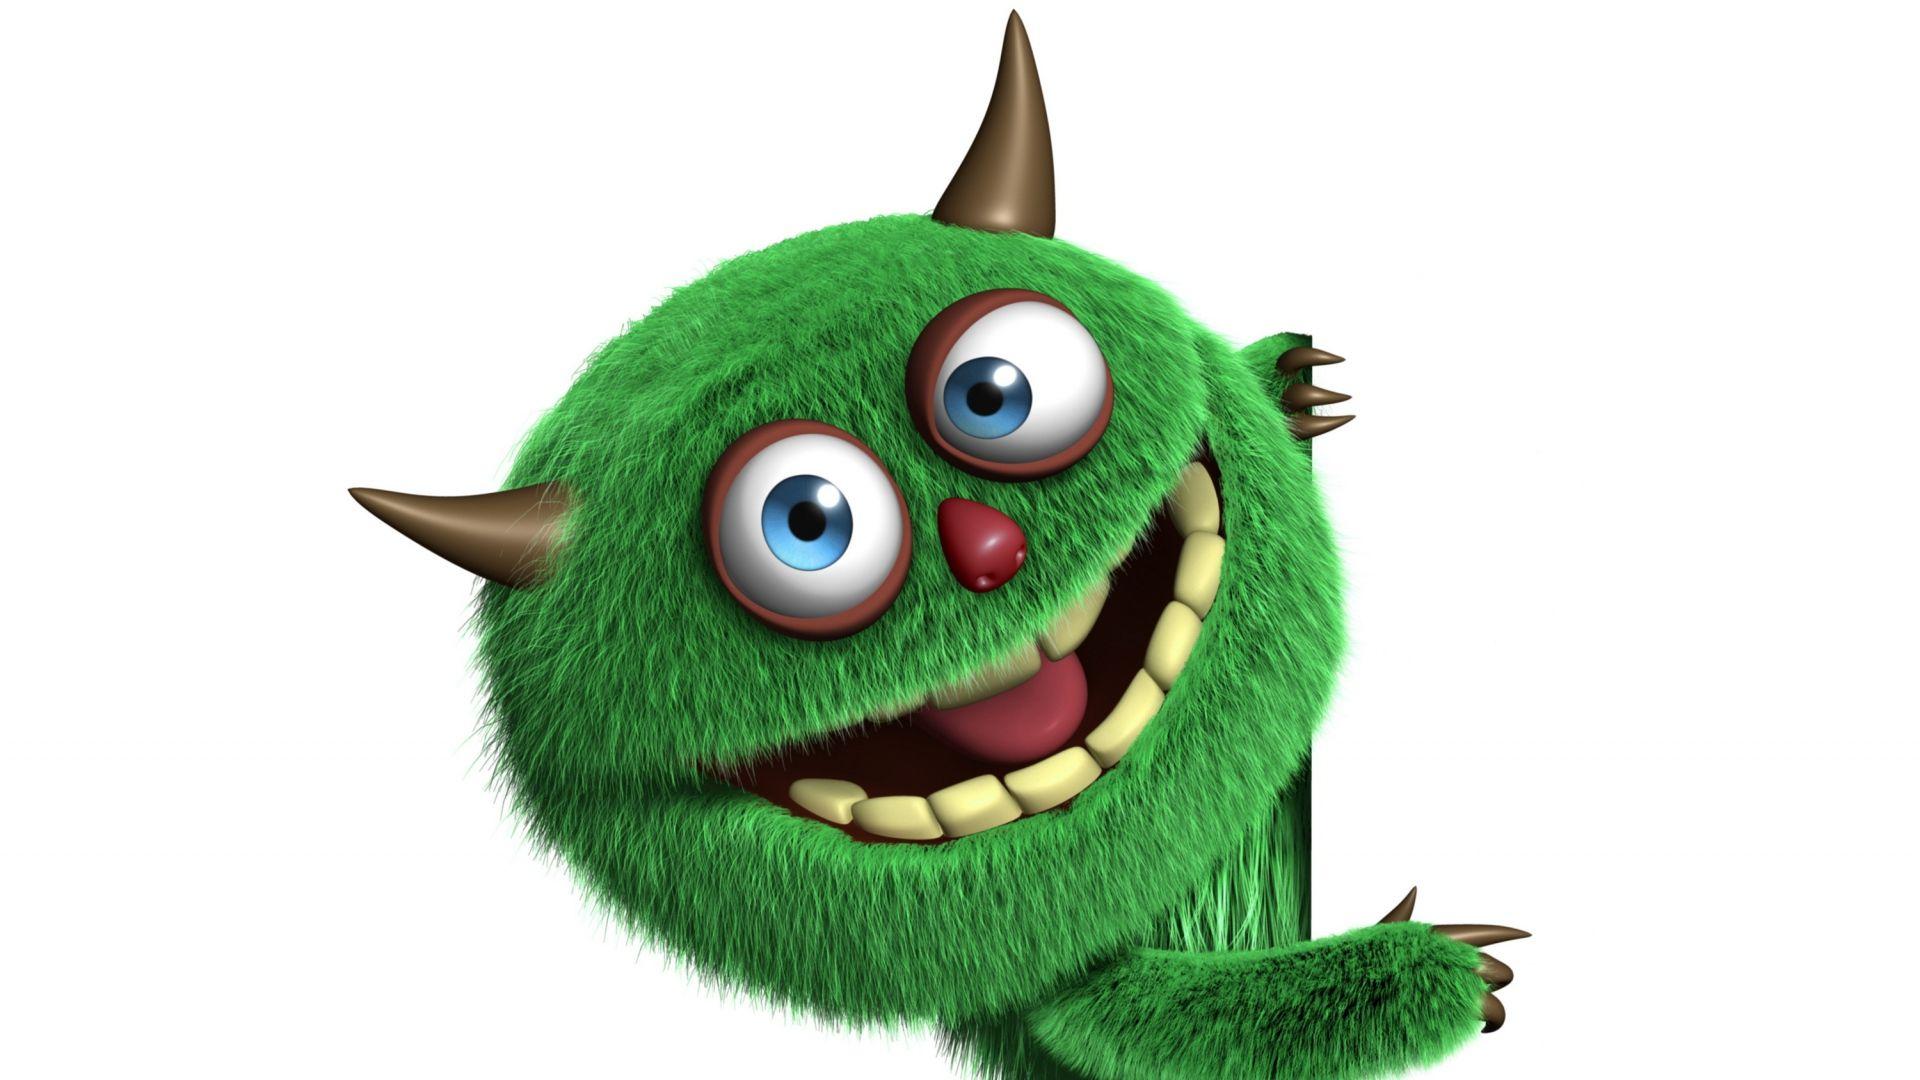 latest 3d monster cute funny furry wallpaper image wallpaper | 3d